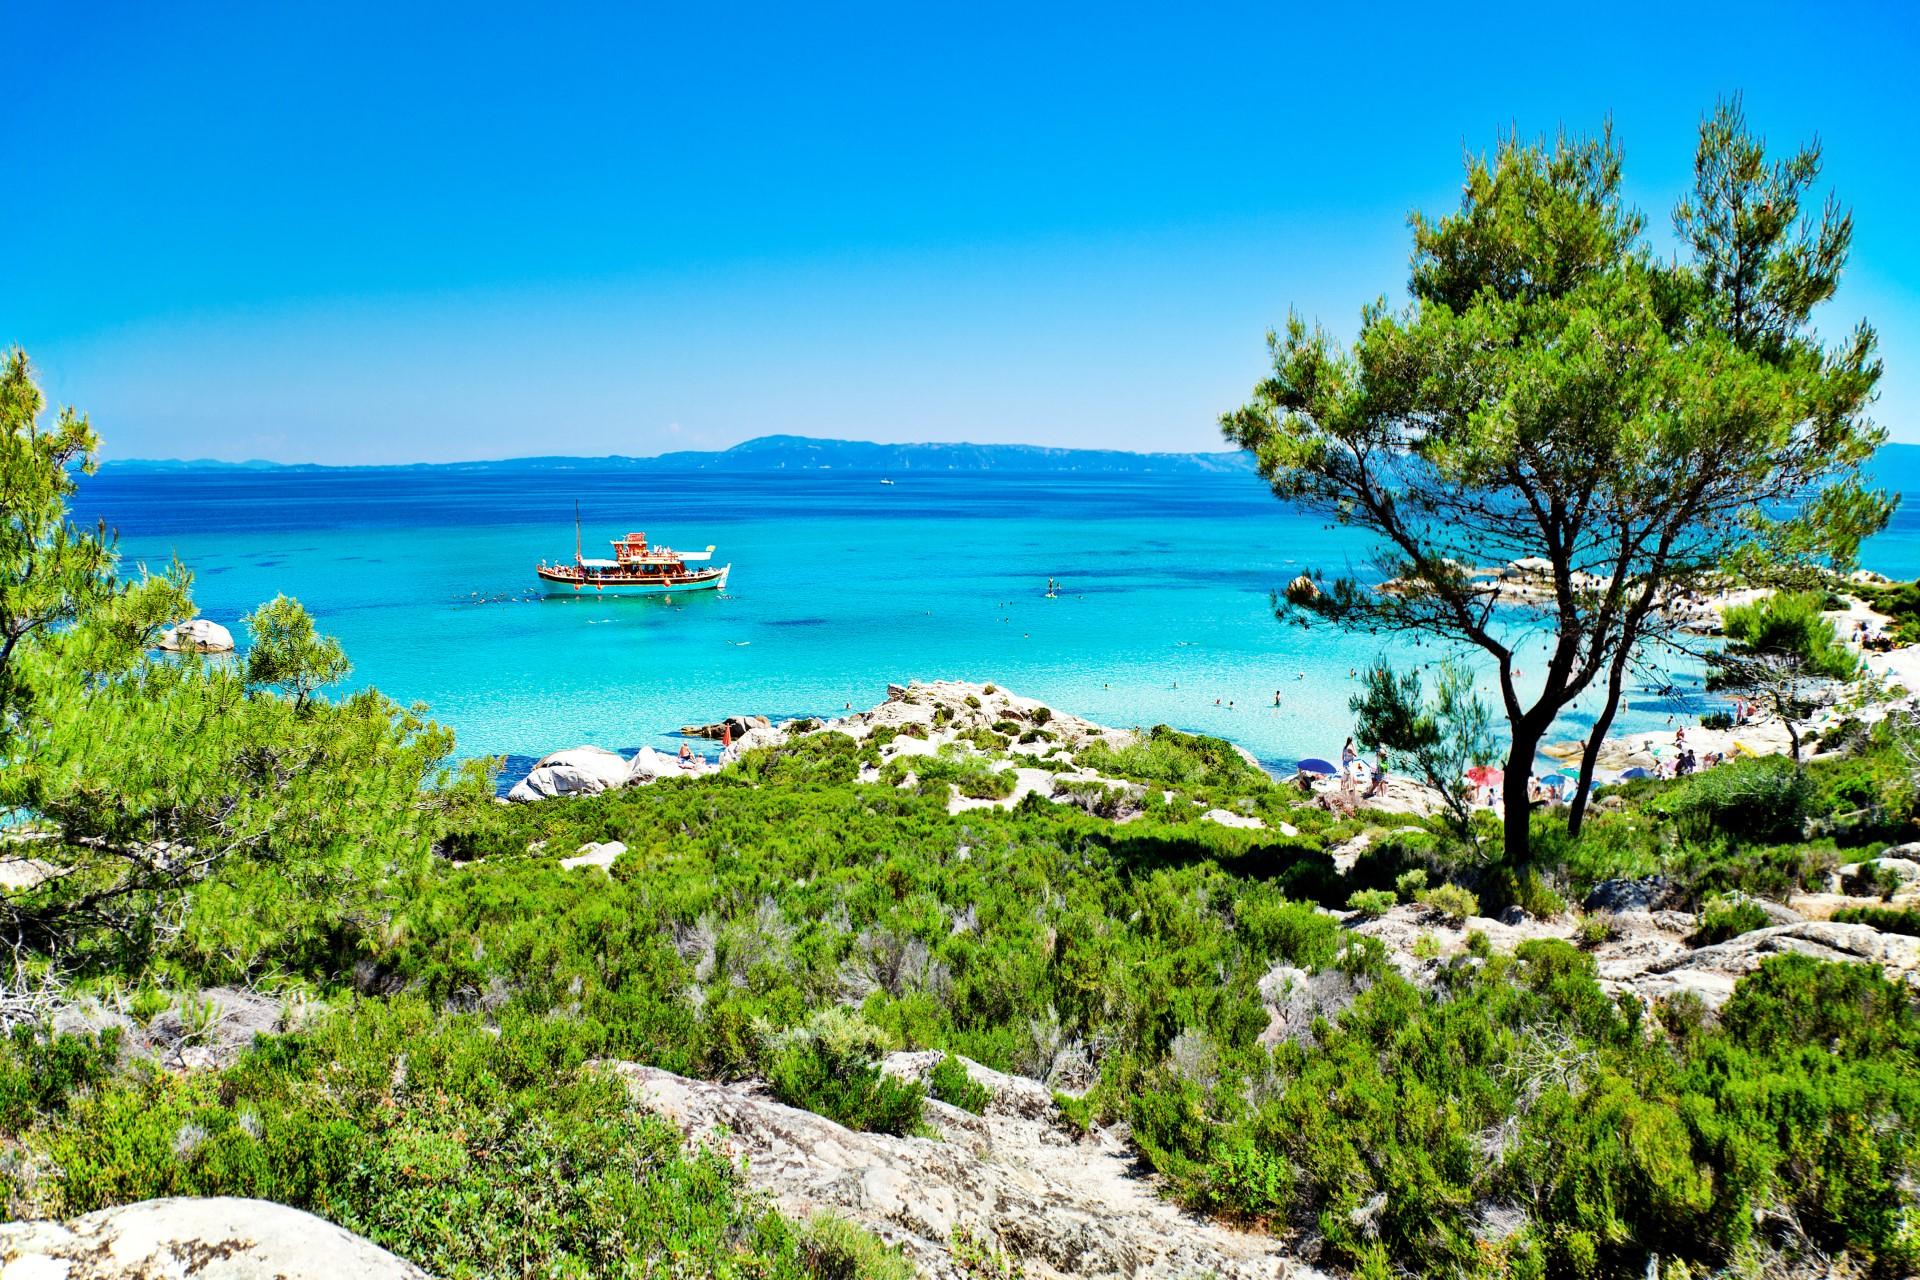 Een panorama van Portokali (Orange) Beach in Sithonia, Halkidiki, Griekenland